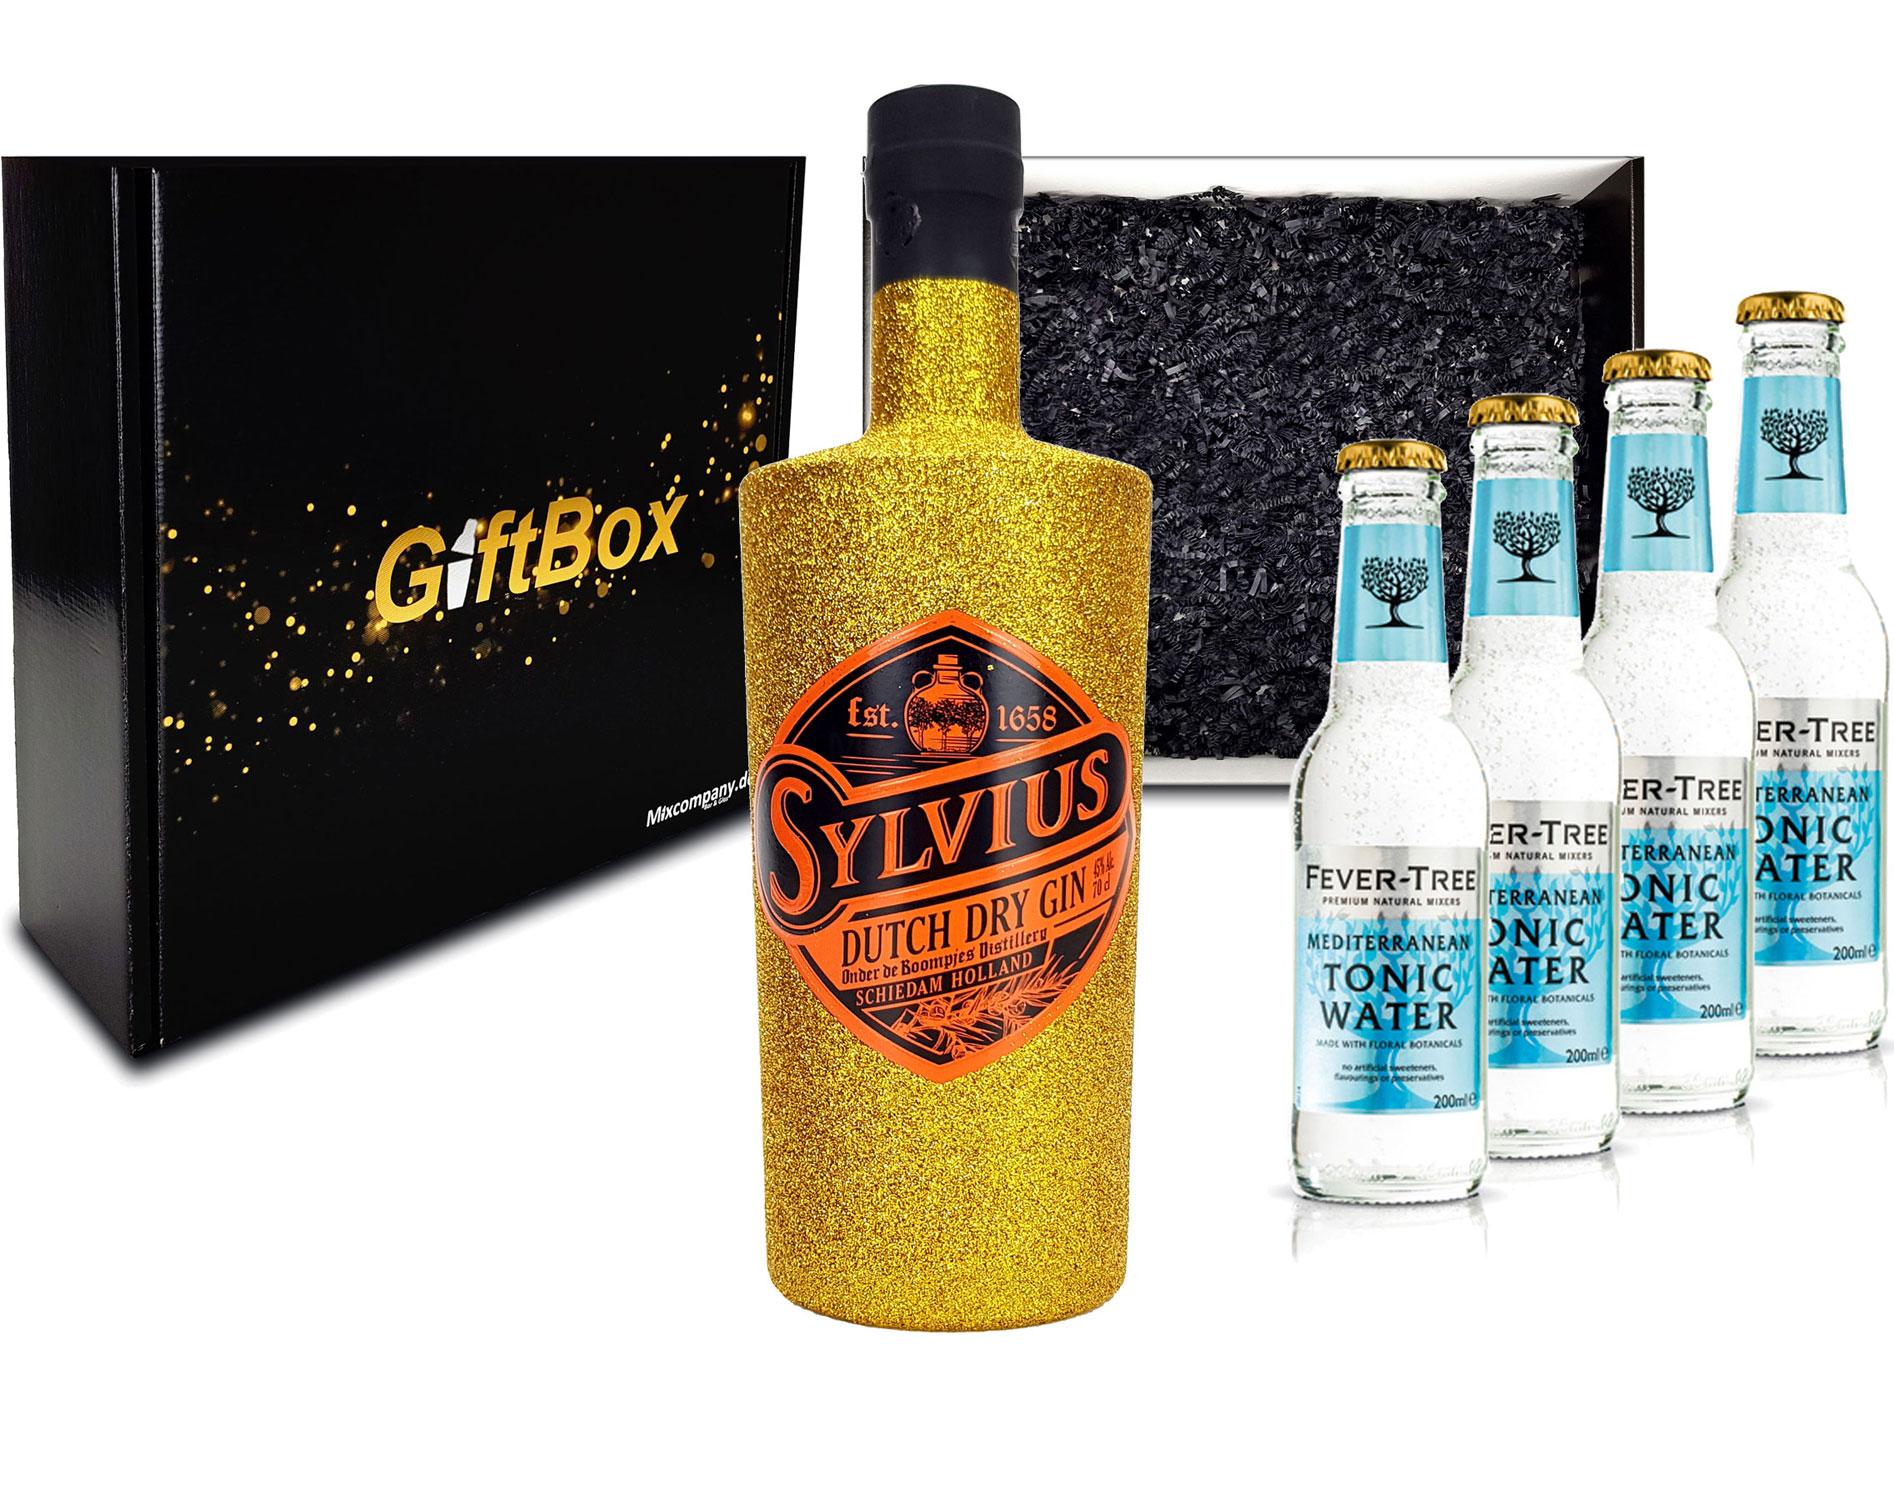 Gin Tonic Giftbox Geschenkset - Sylvius Dutch Gin Bling Bling Glitzerflasche Gold 0,7l 700ml (45% Vol) + 4x Fever Tree Mediterranean Tonic Water 200ml inkl. Pfand MEHRWEG - [Enthält Sulfite]